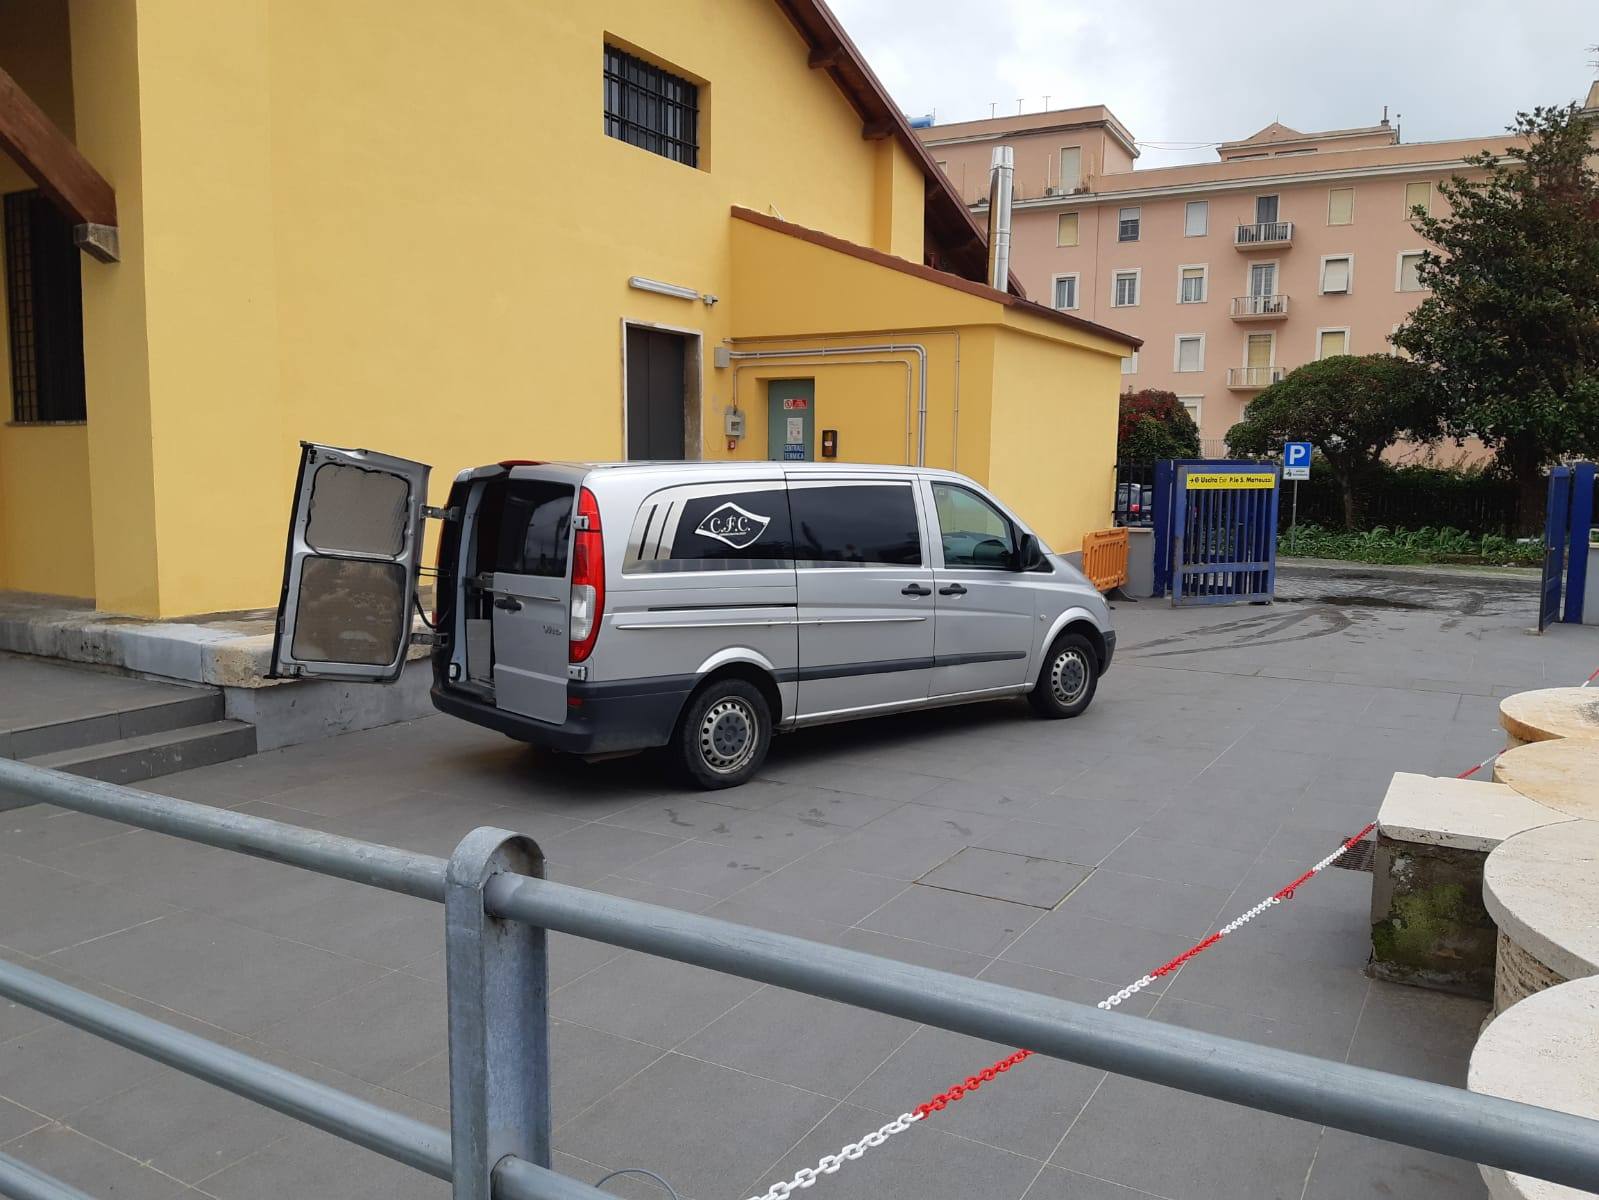 Tragedia sul regionale Civitavecchia Roma - Centumcellae News